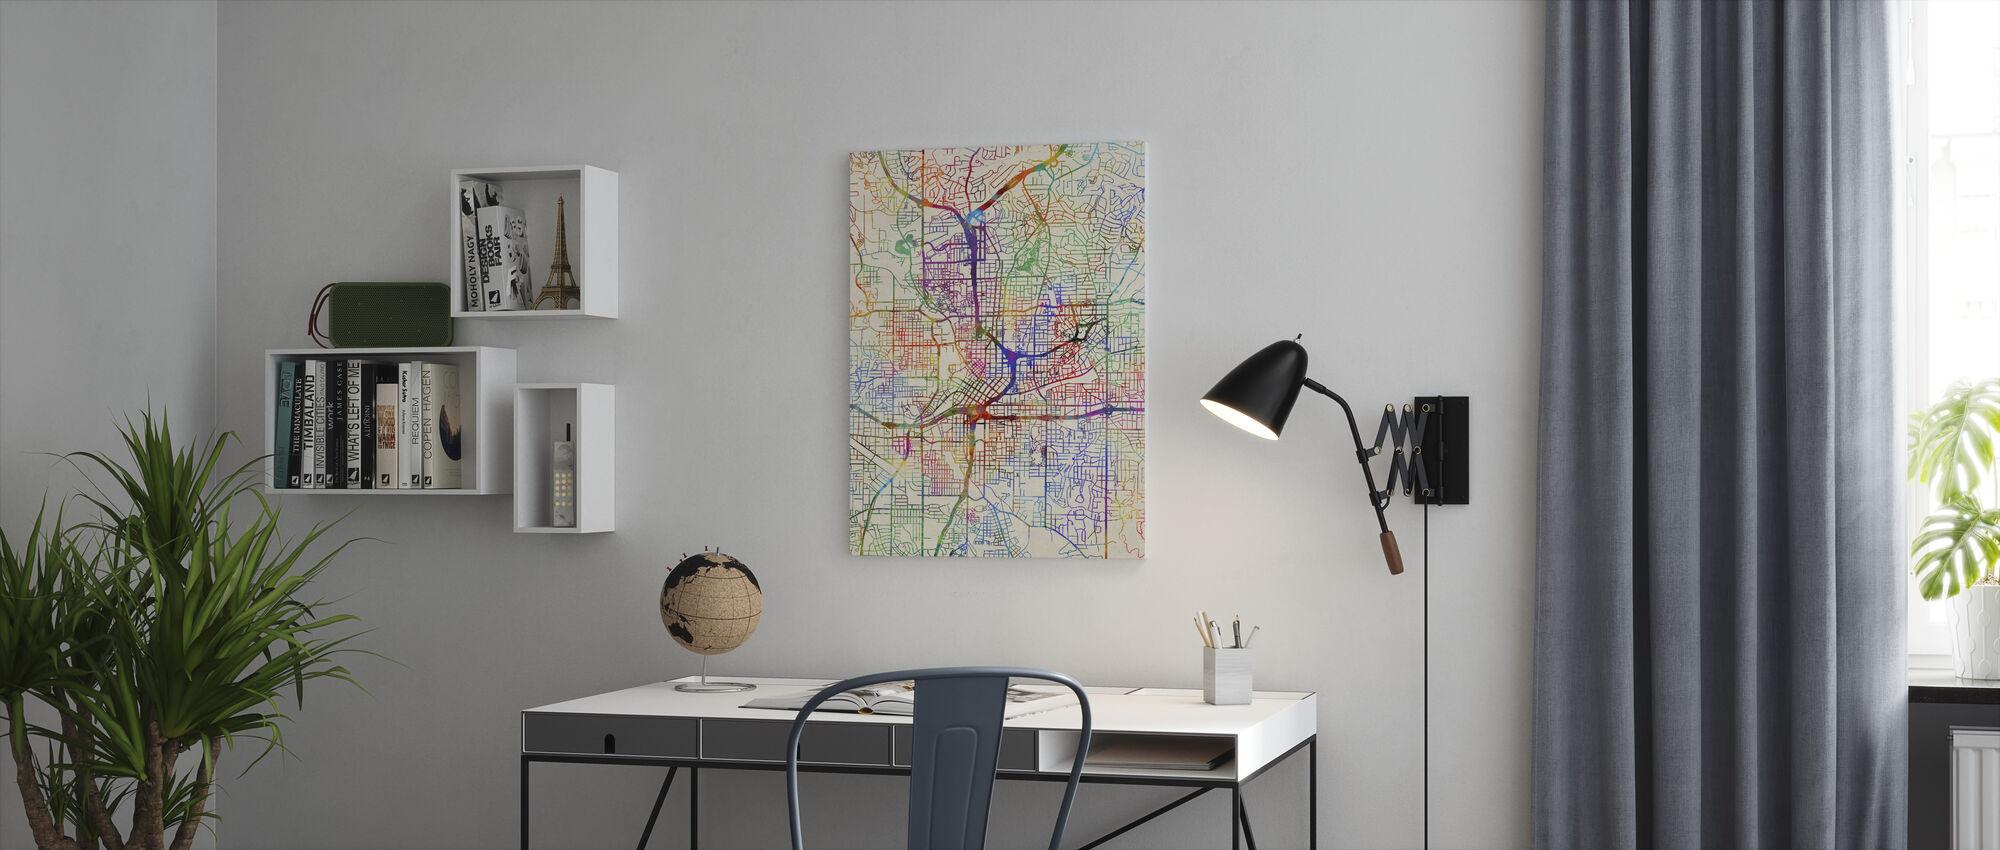 Atlanta Georgia City Map - Canvas print - Office